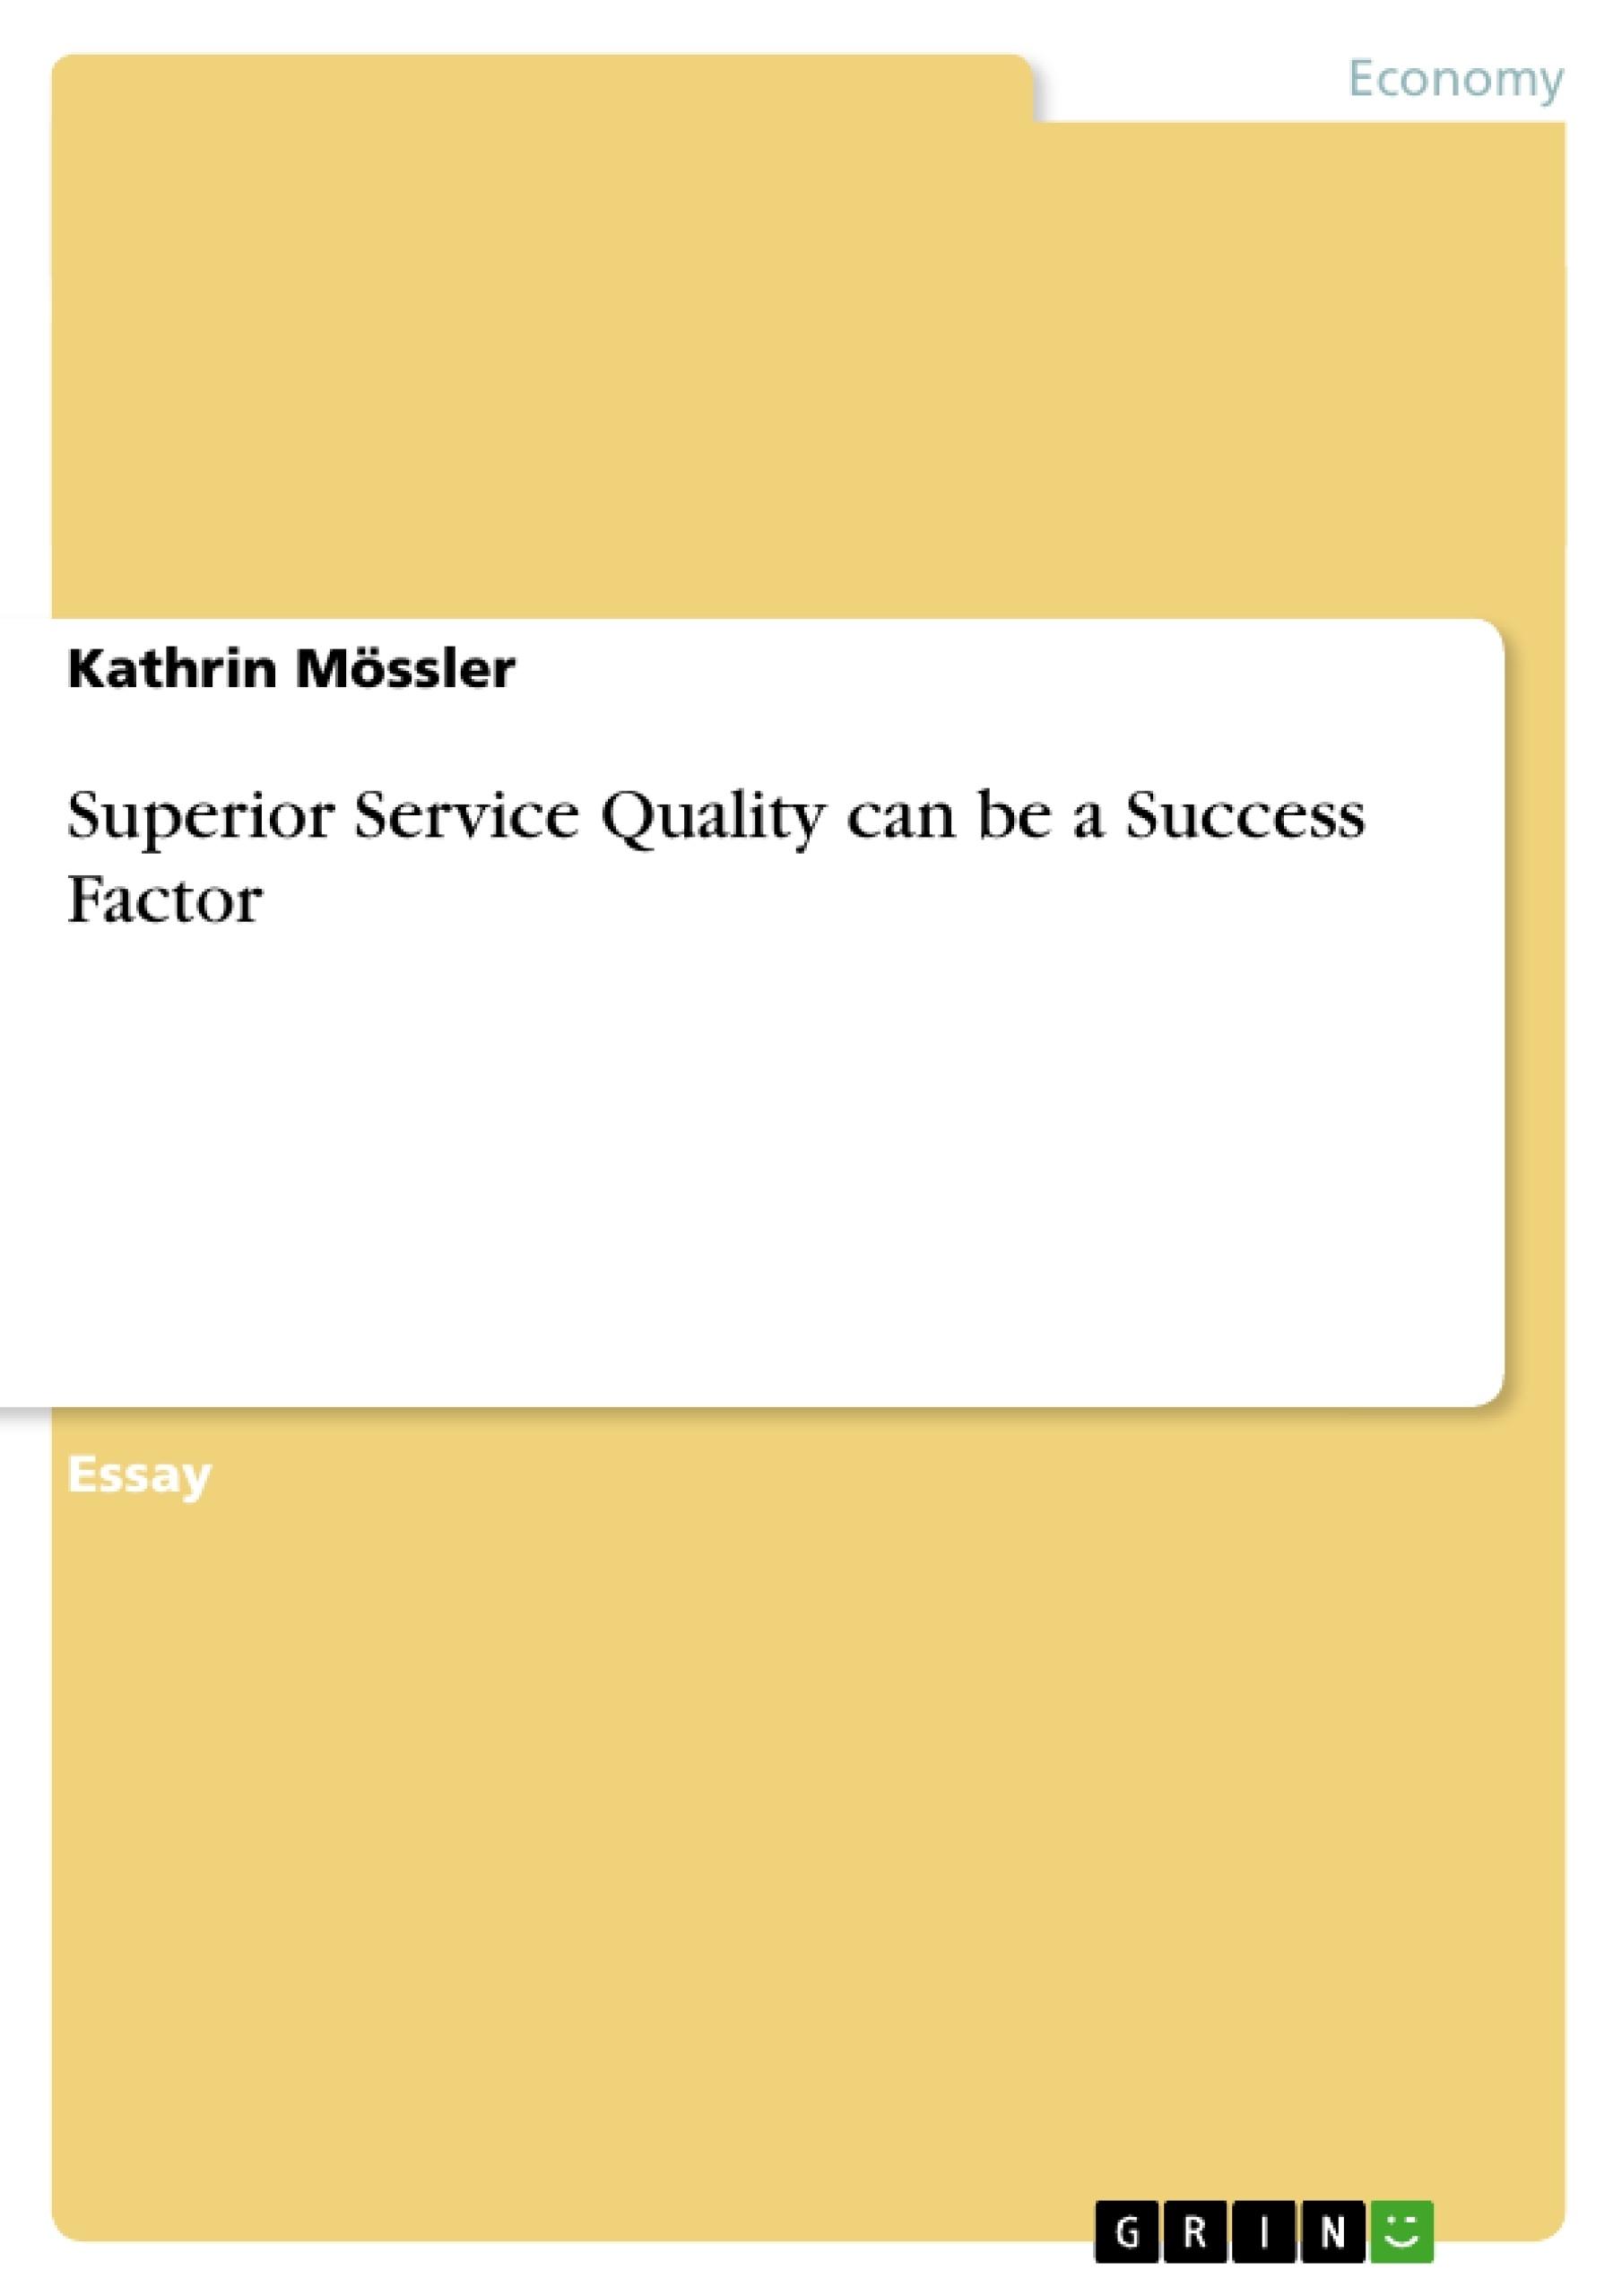 essay on service quality